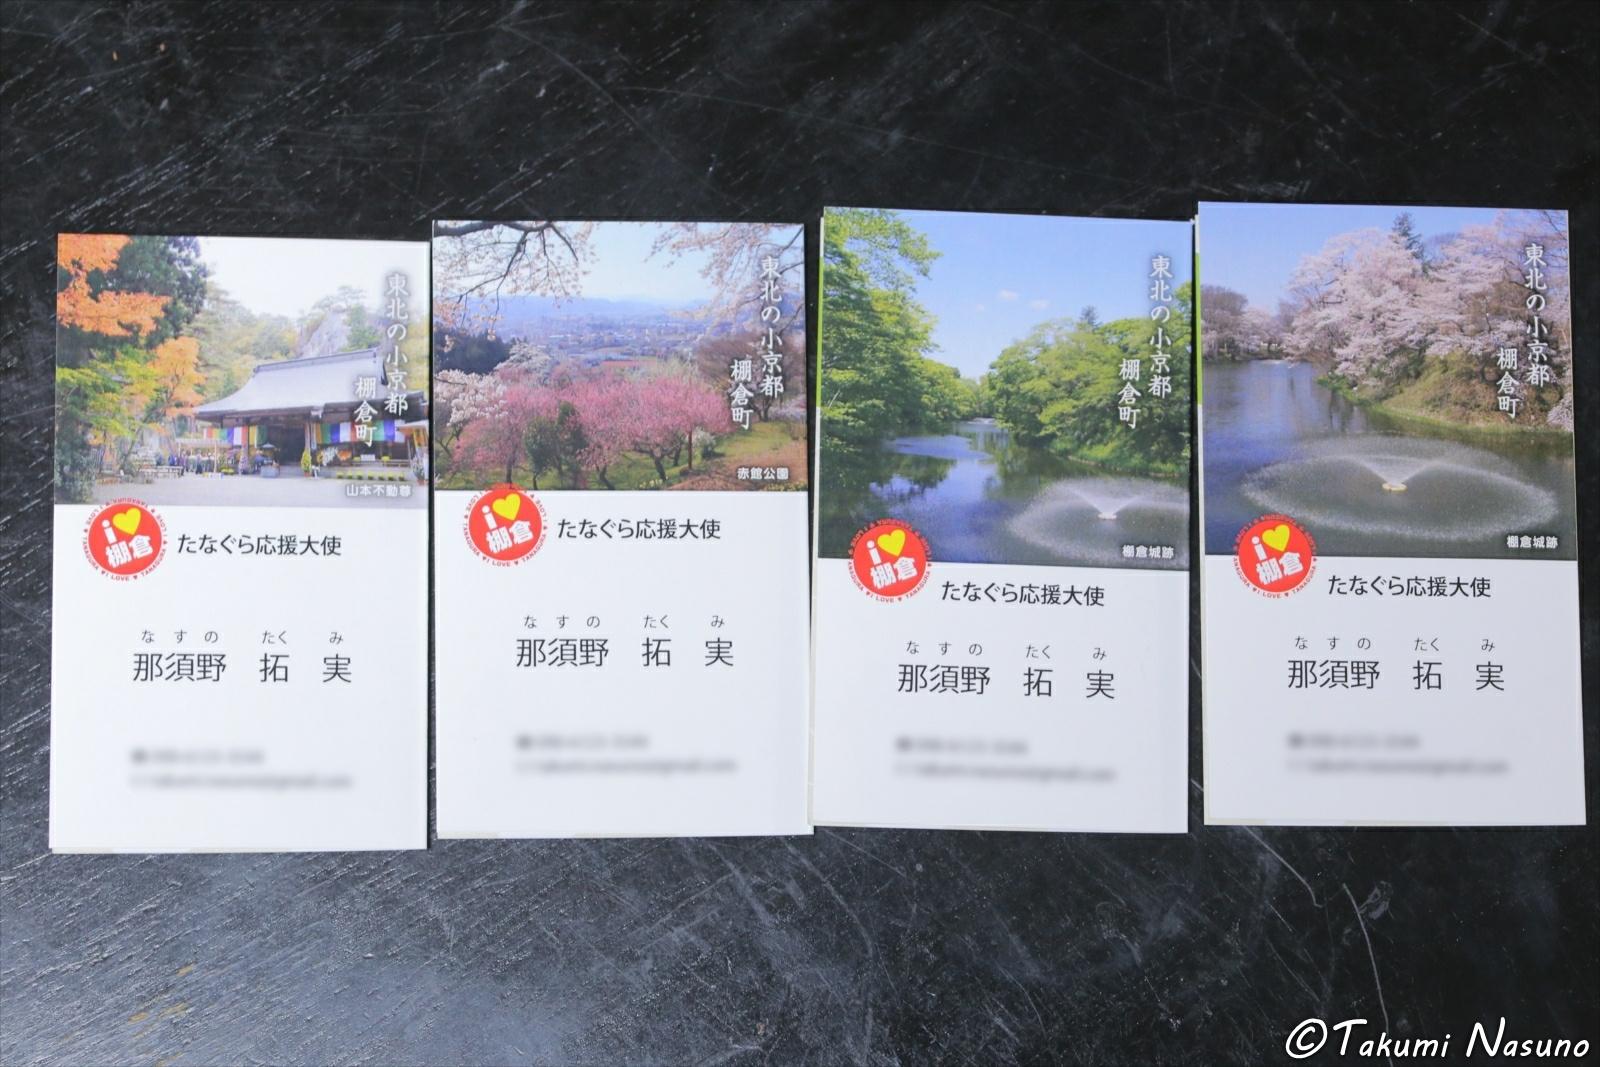 Four Business Cards of Tanagura Supporter's Ambassador